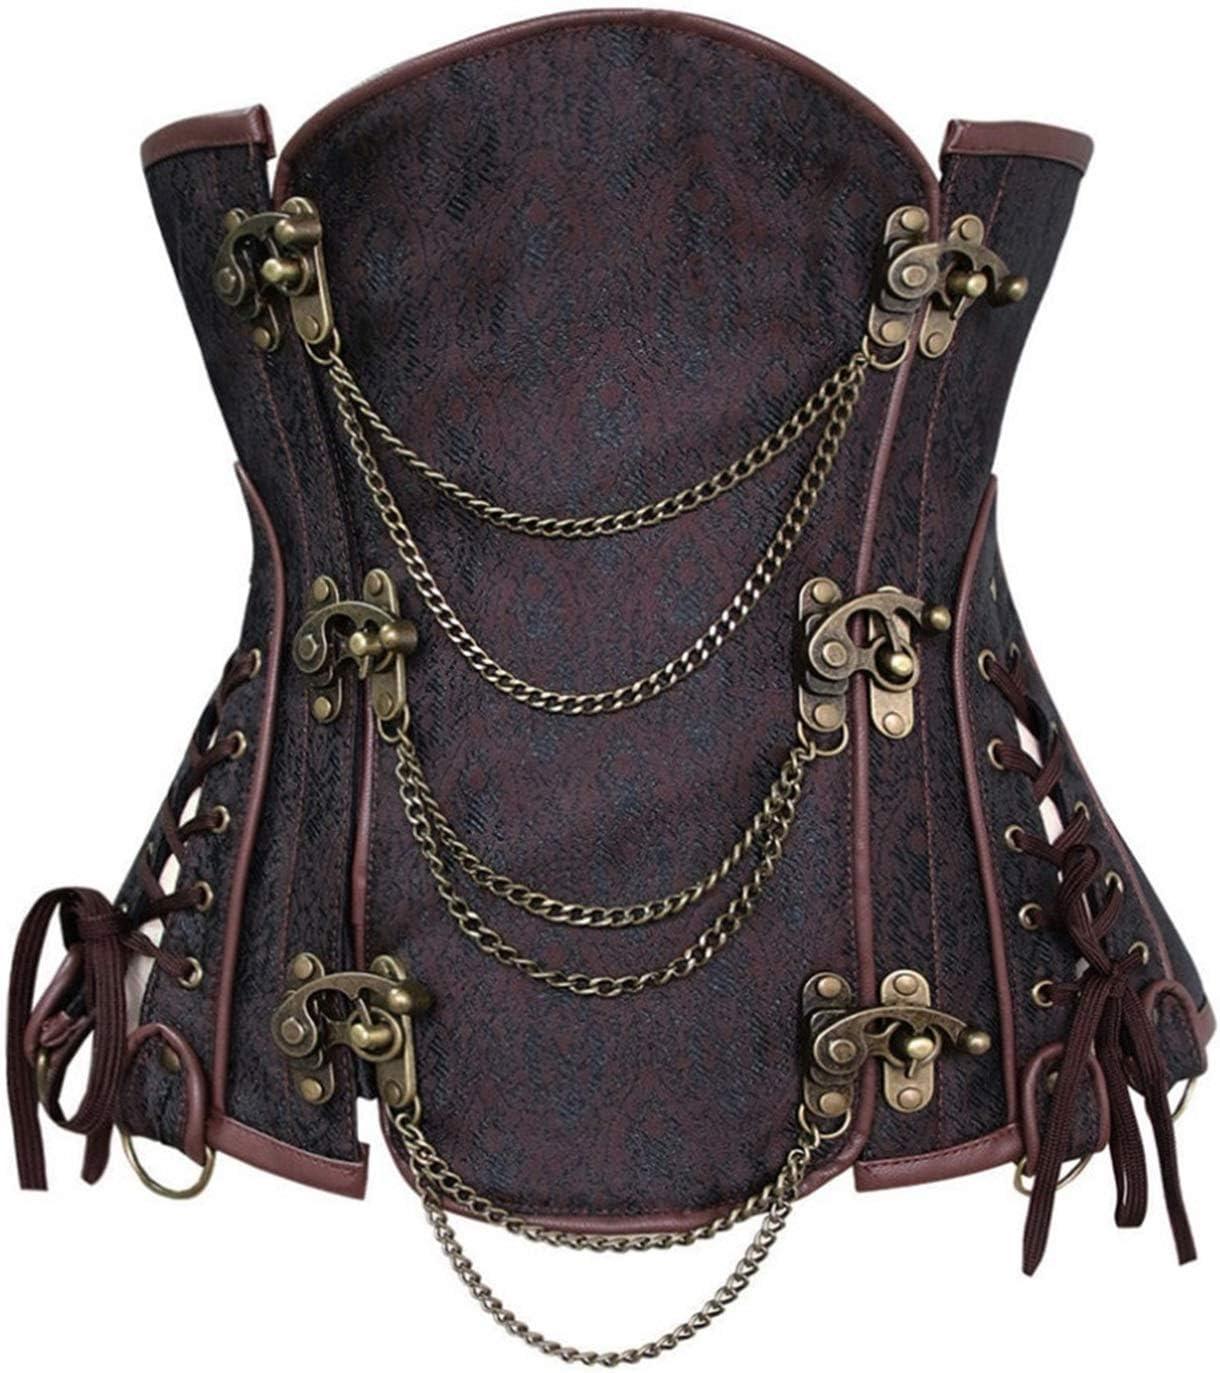 YCRCTC favorite Women Burlesque Steampunk Translated Gothic Spiral Underbust Corset